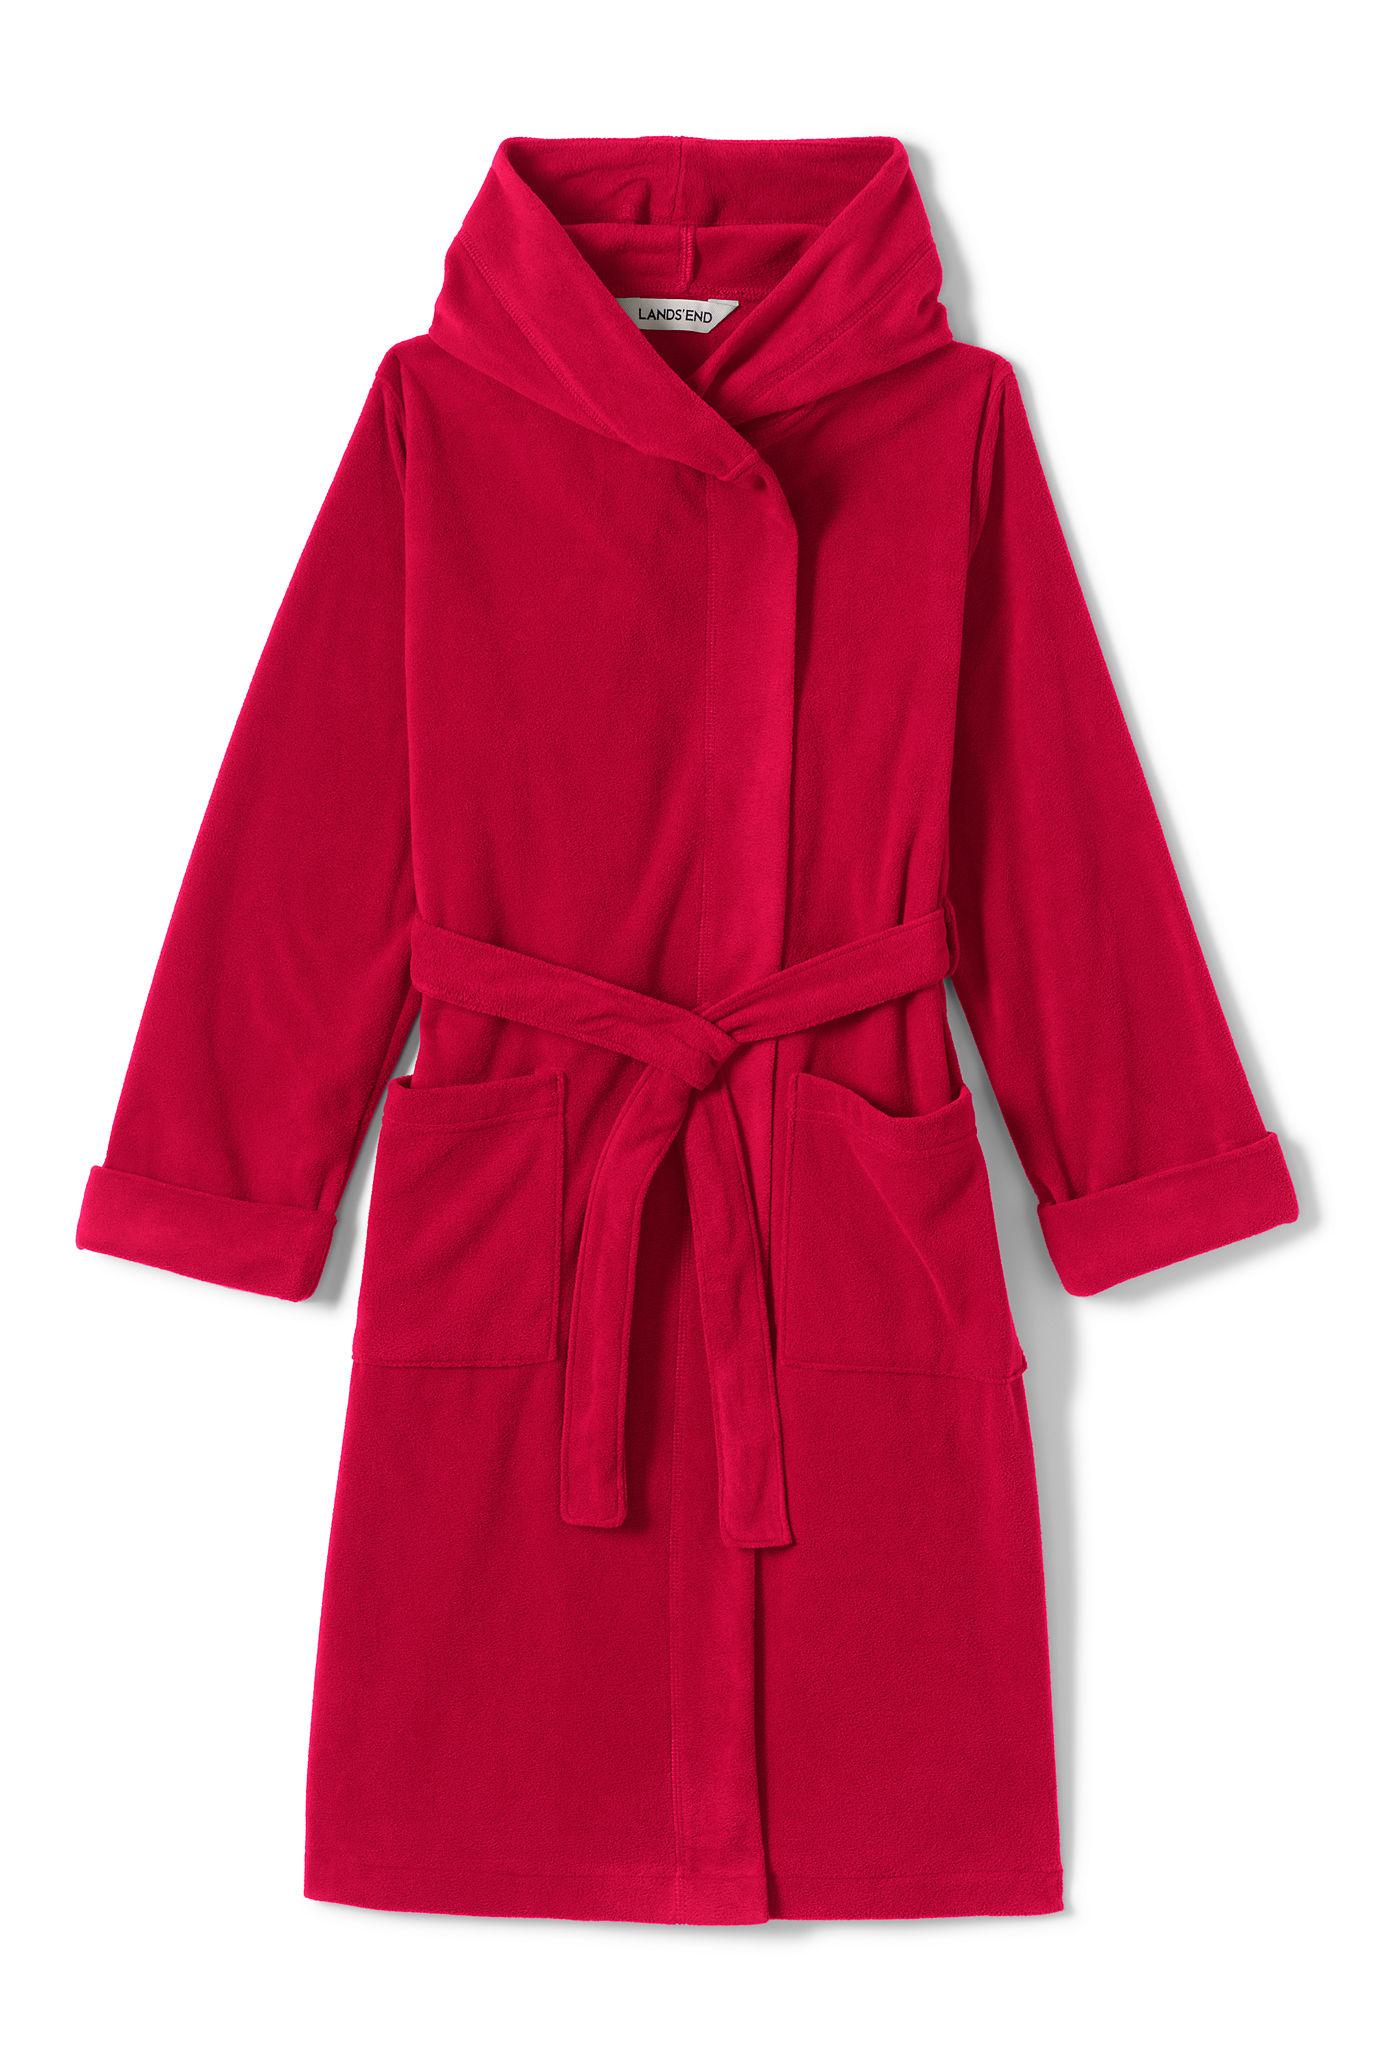 bath robe.jpeg